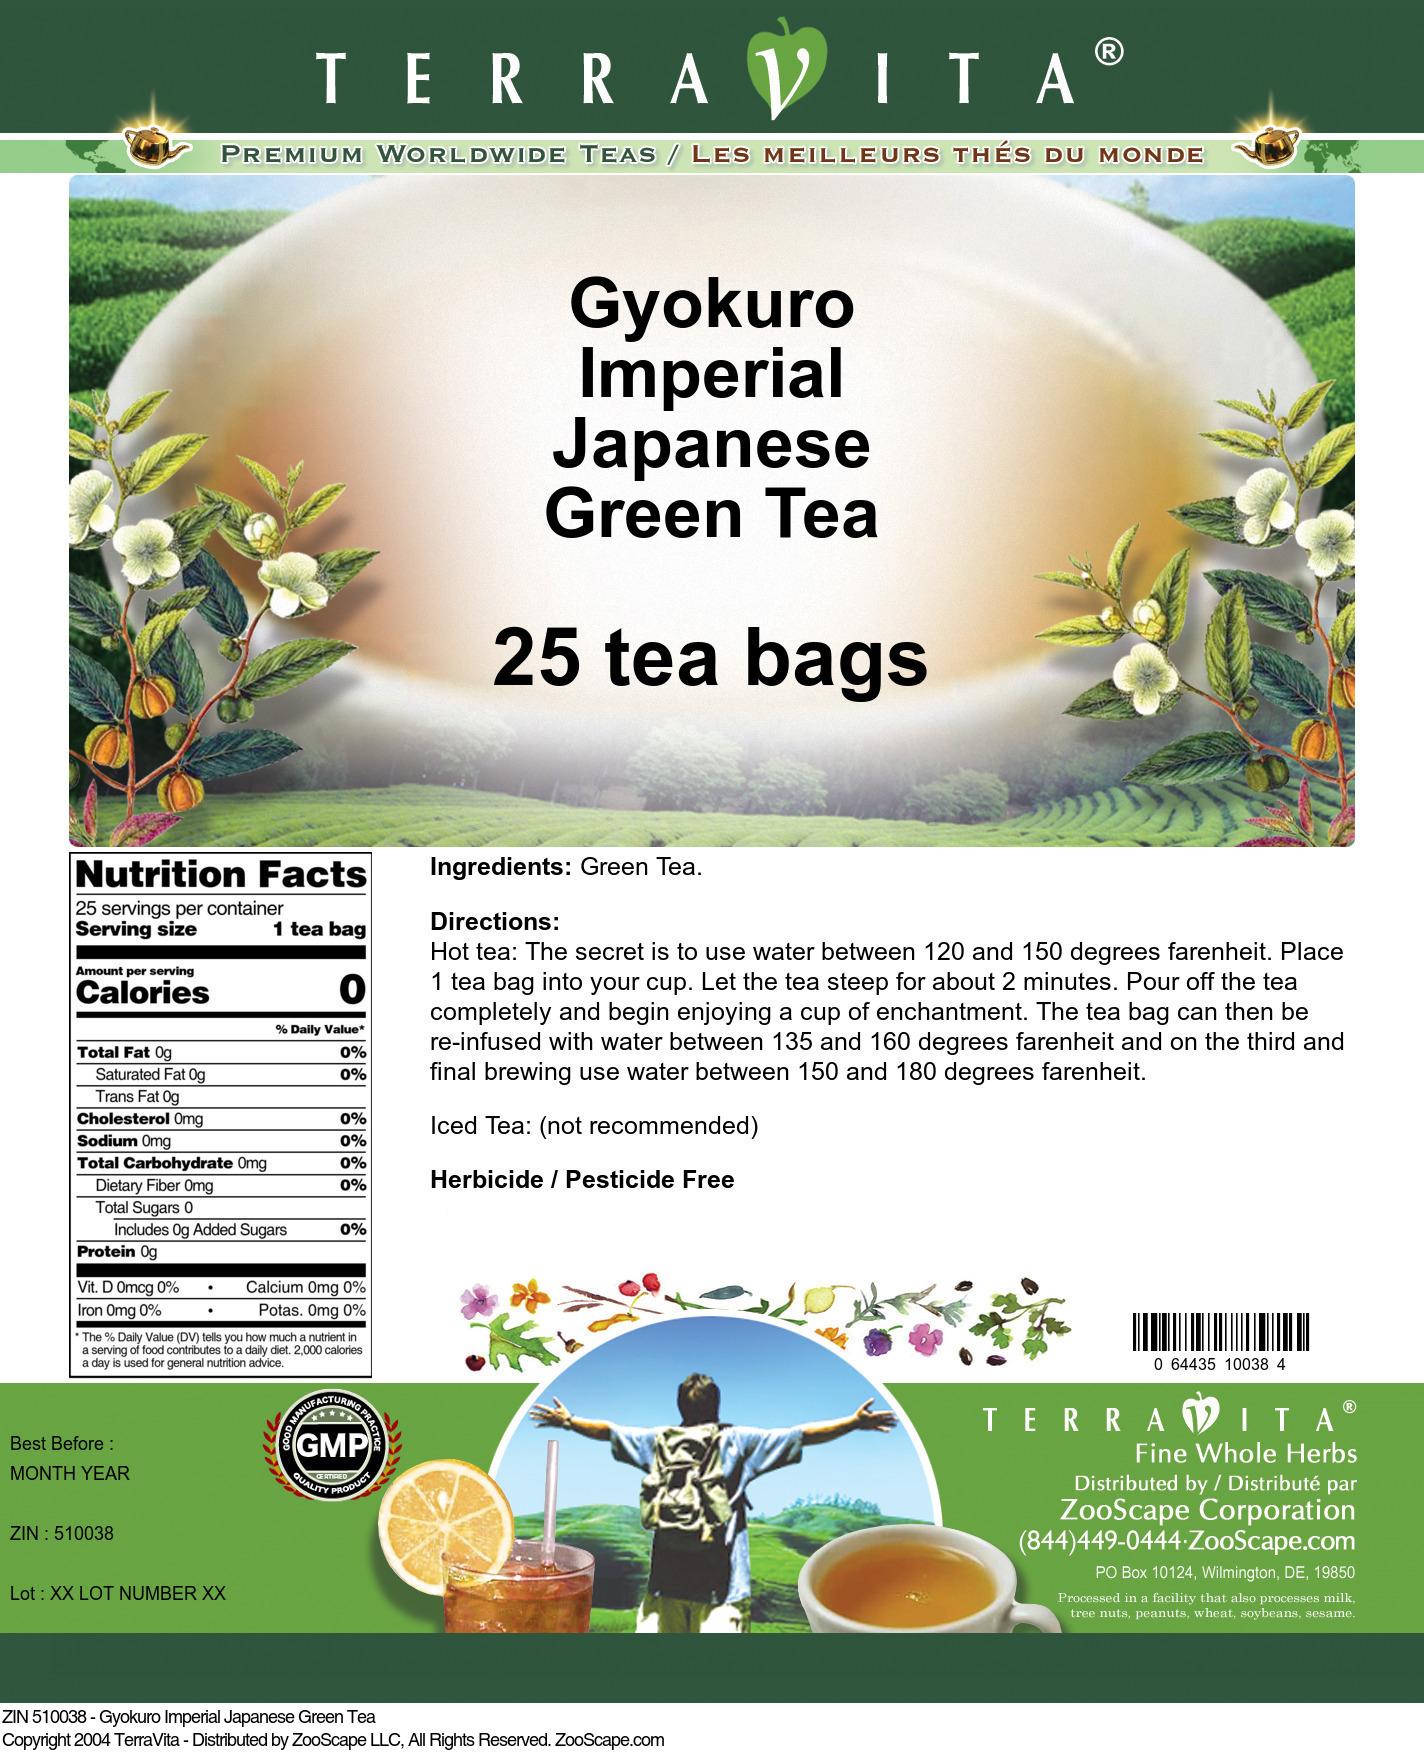 Gyokuro Imperial Japanese Green Tea